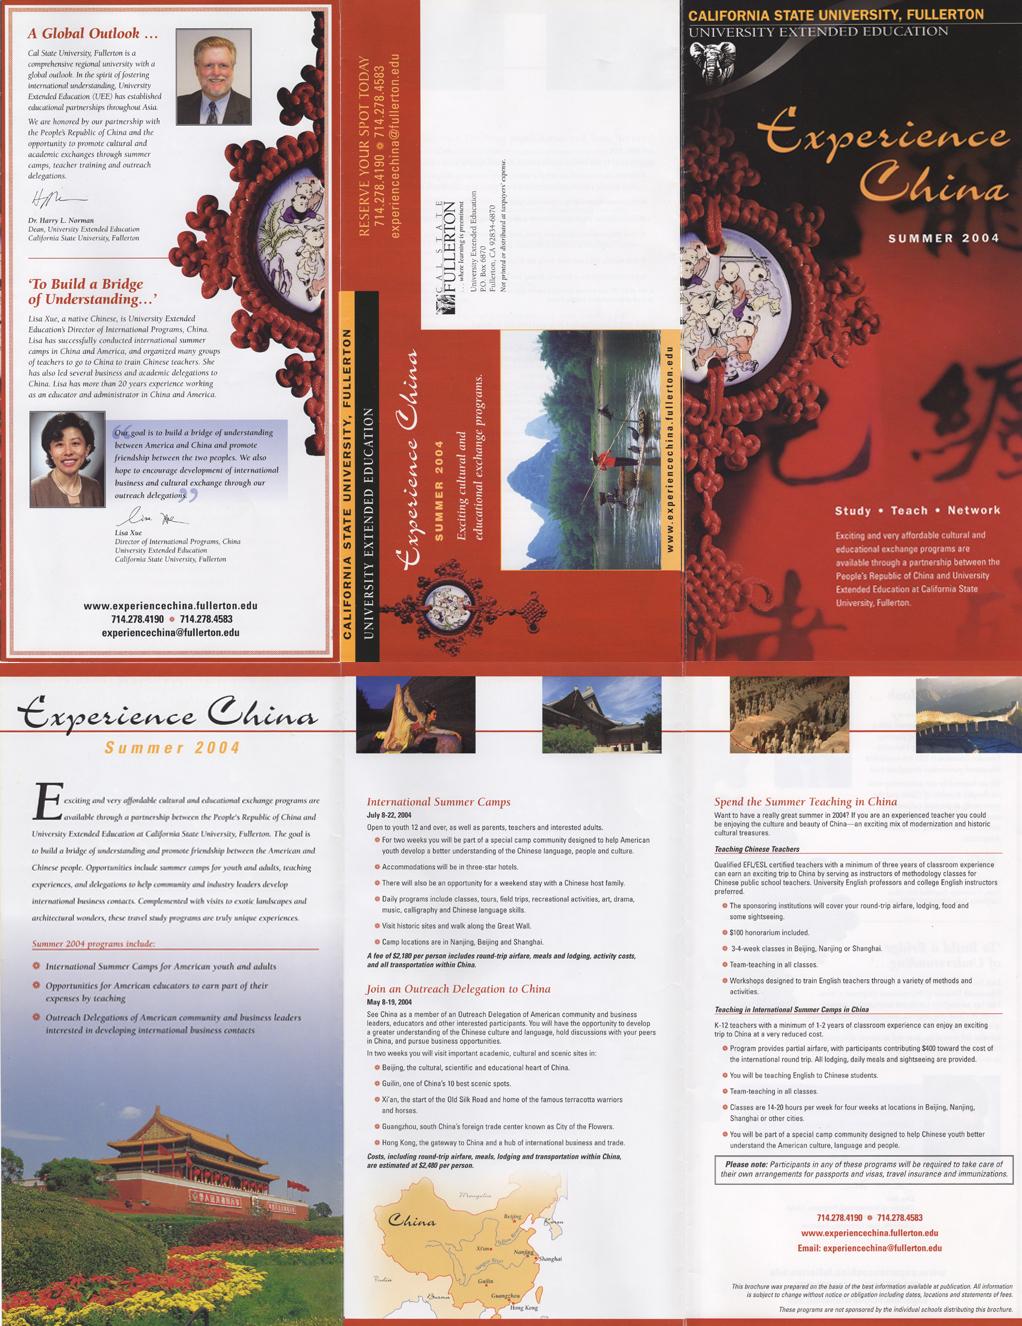 Experience China brochure